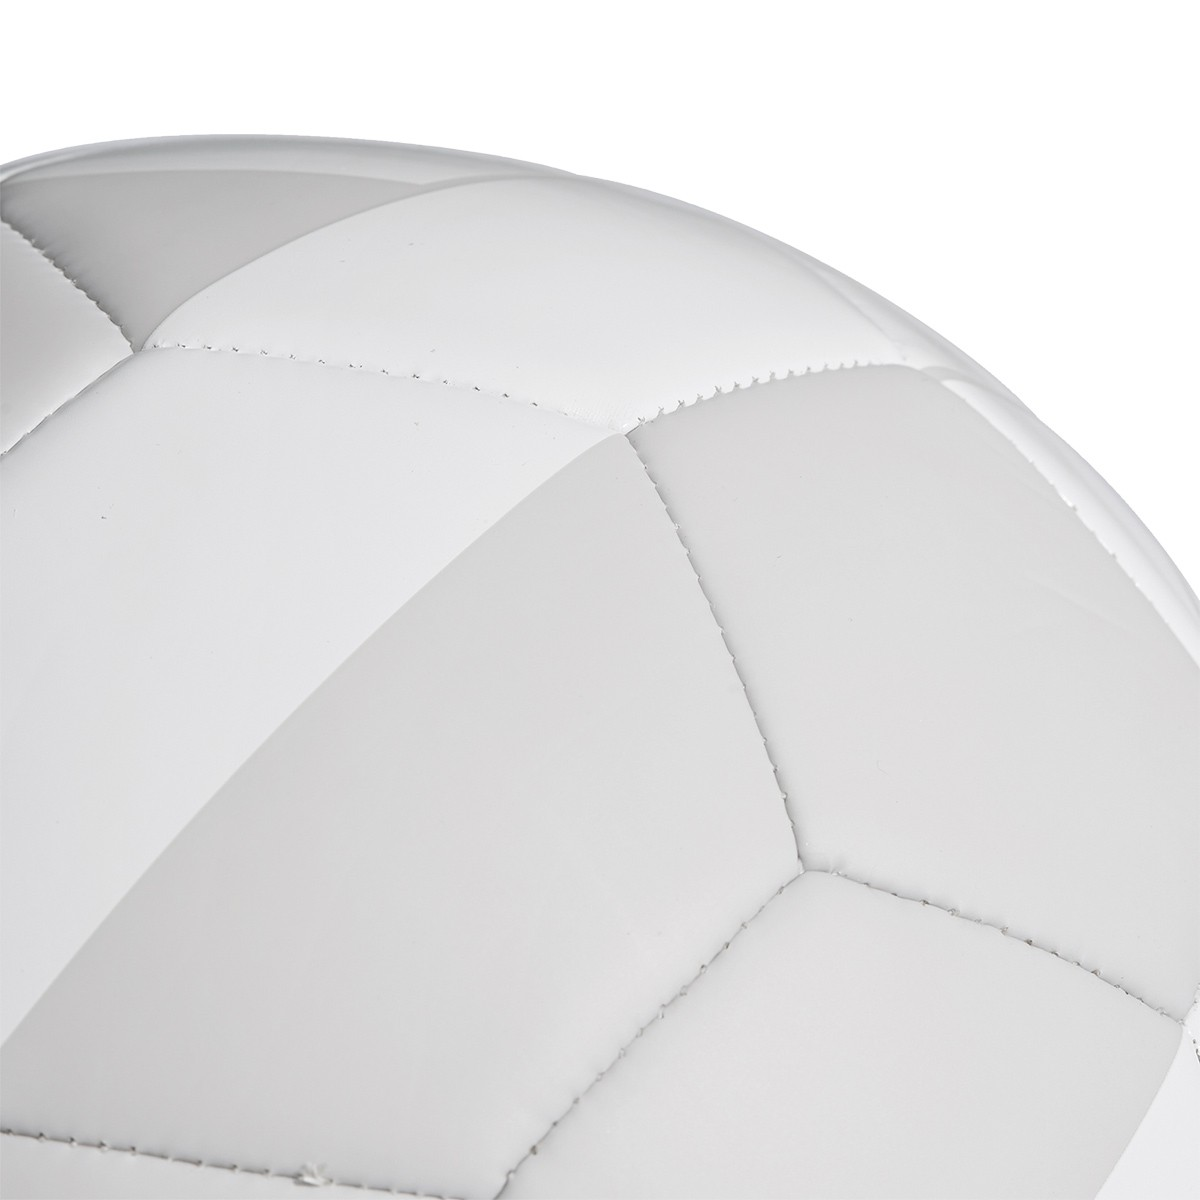 c720d1842e601 Balón adidas Real Madrid 2018-2019 Cream white-Grey one-Black - Tienda de fútbol  Fútbol Emotion